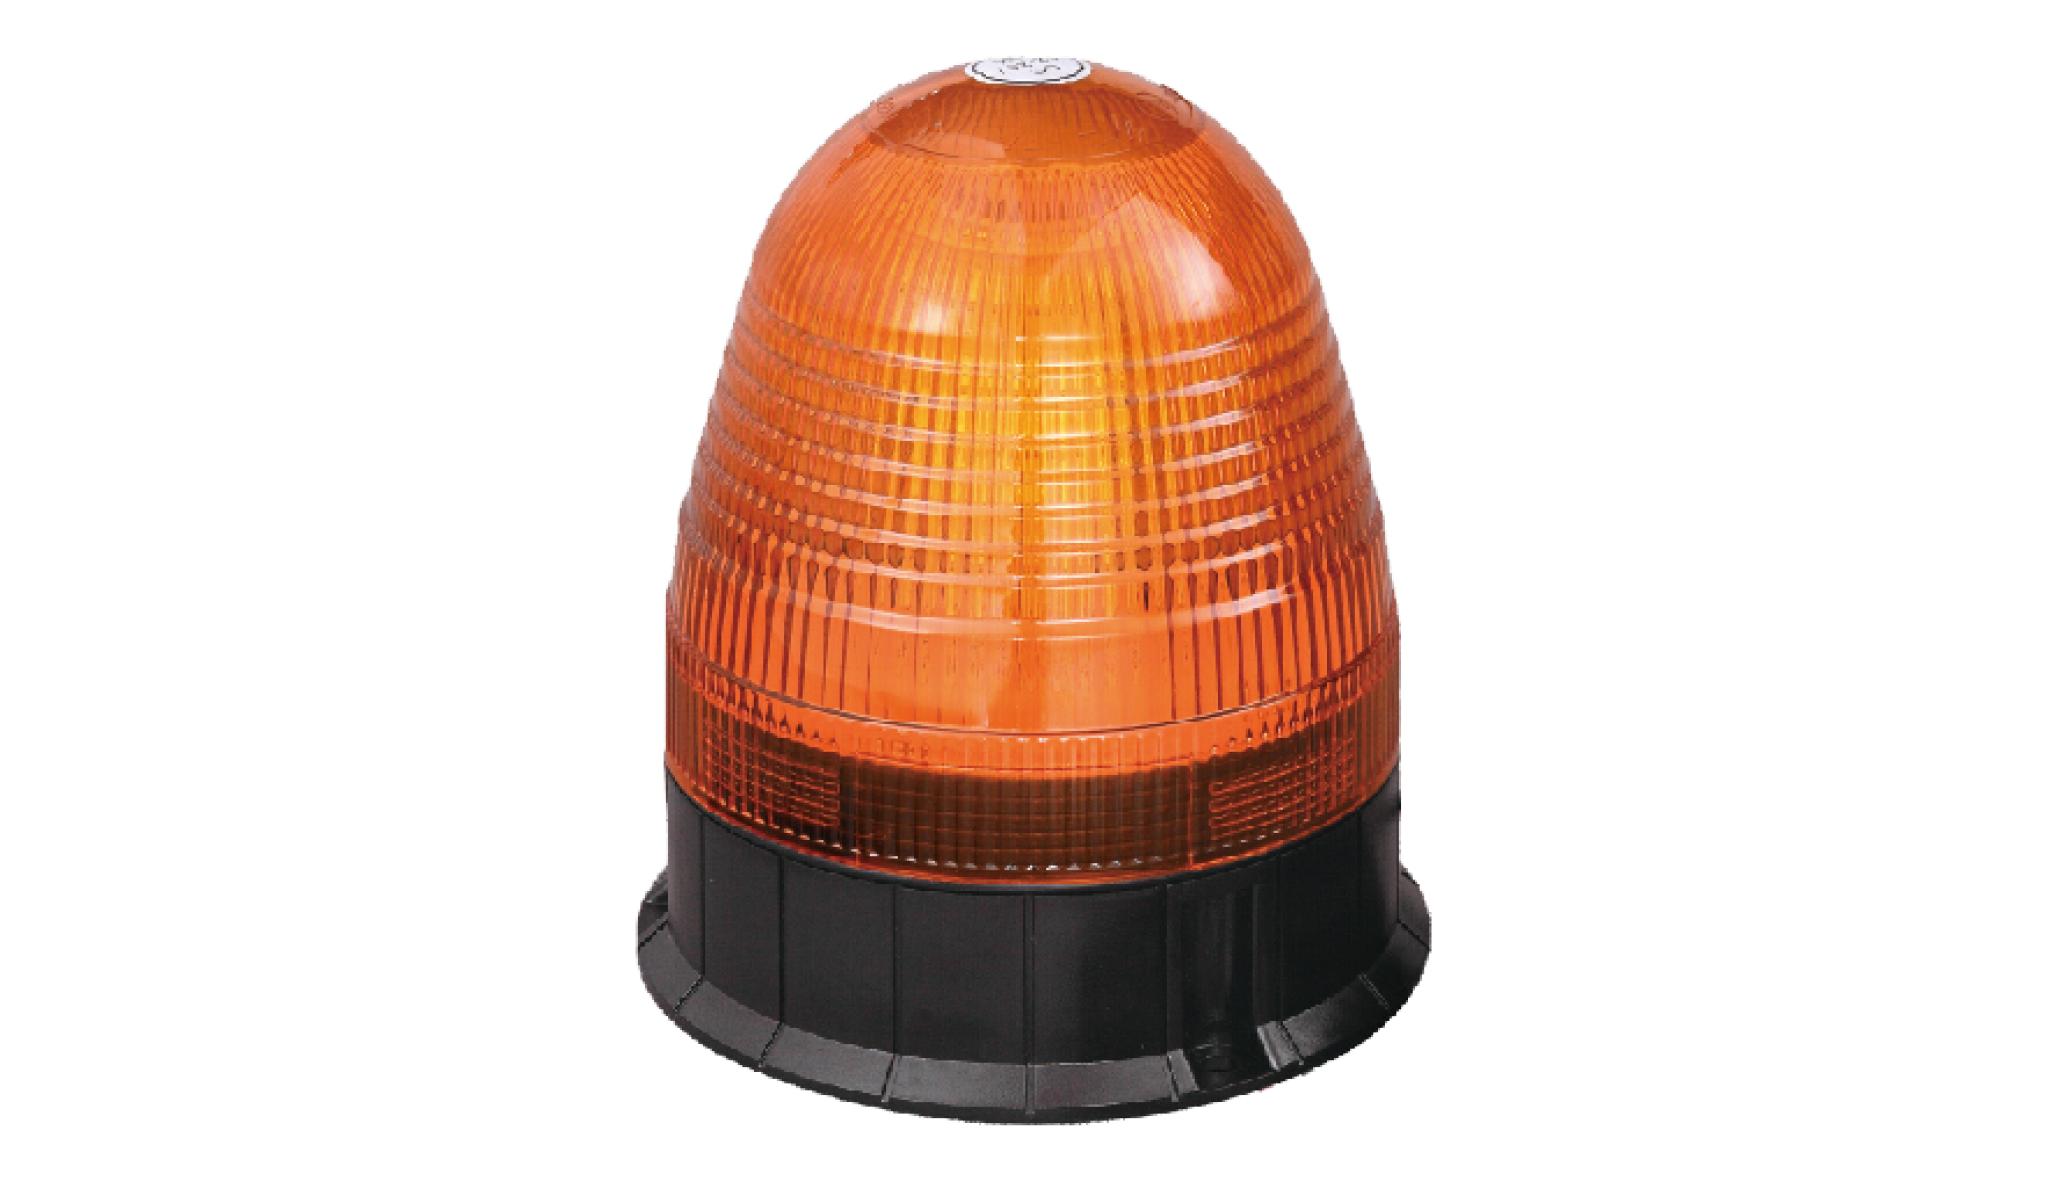 VLMB LED Beacons